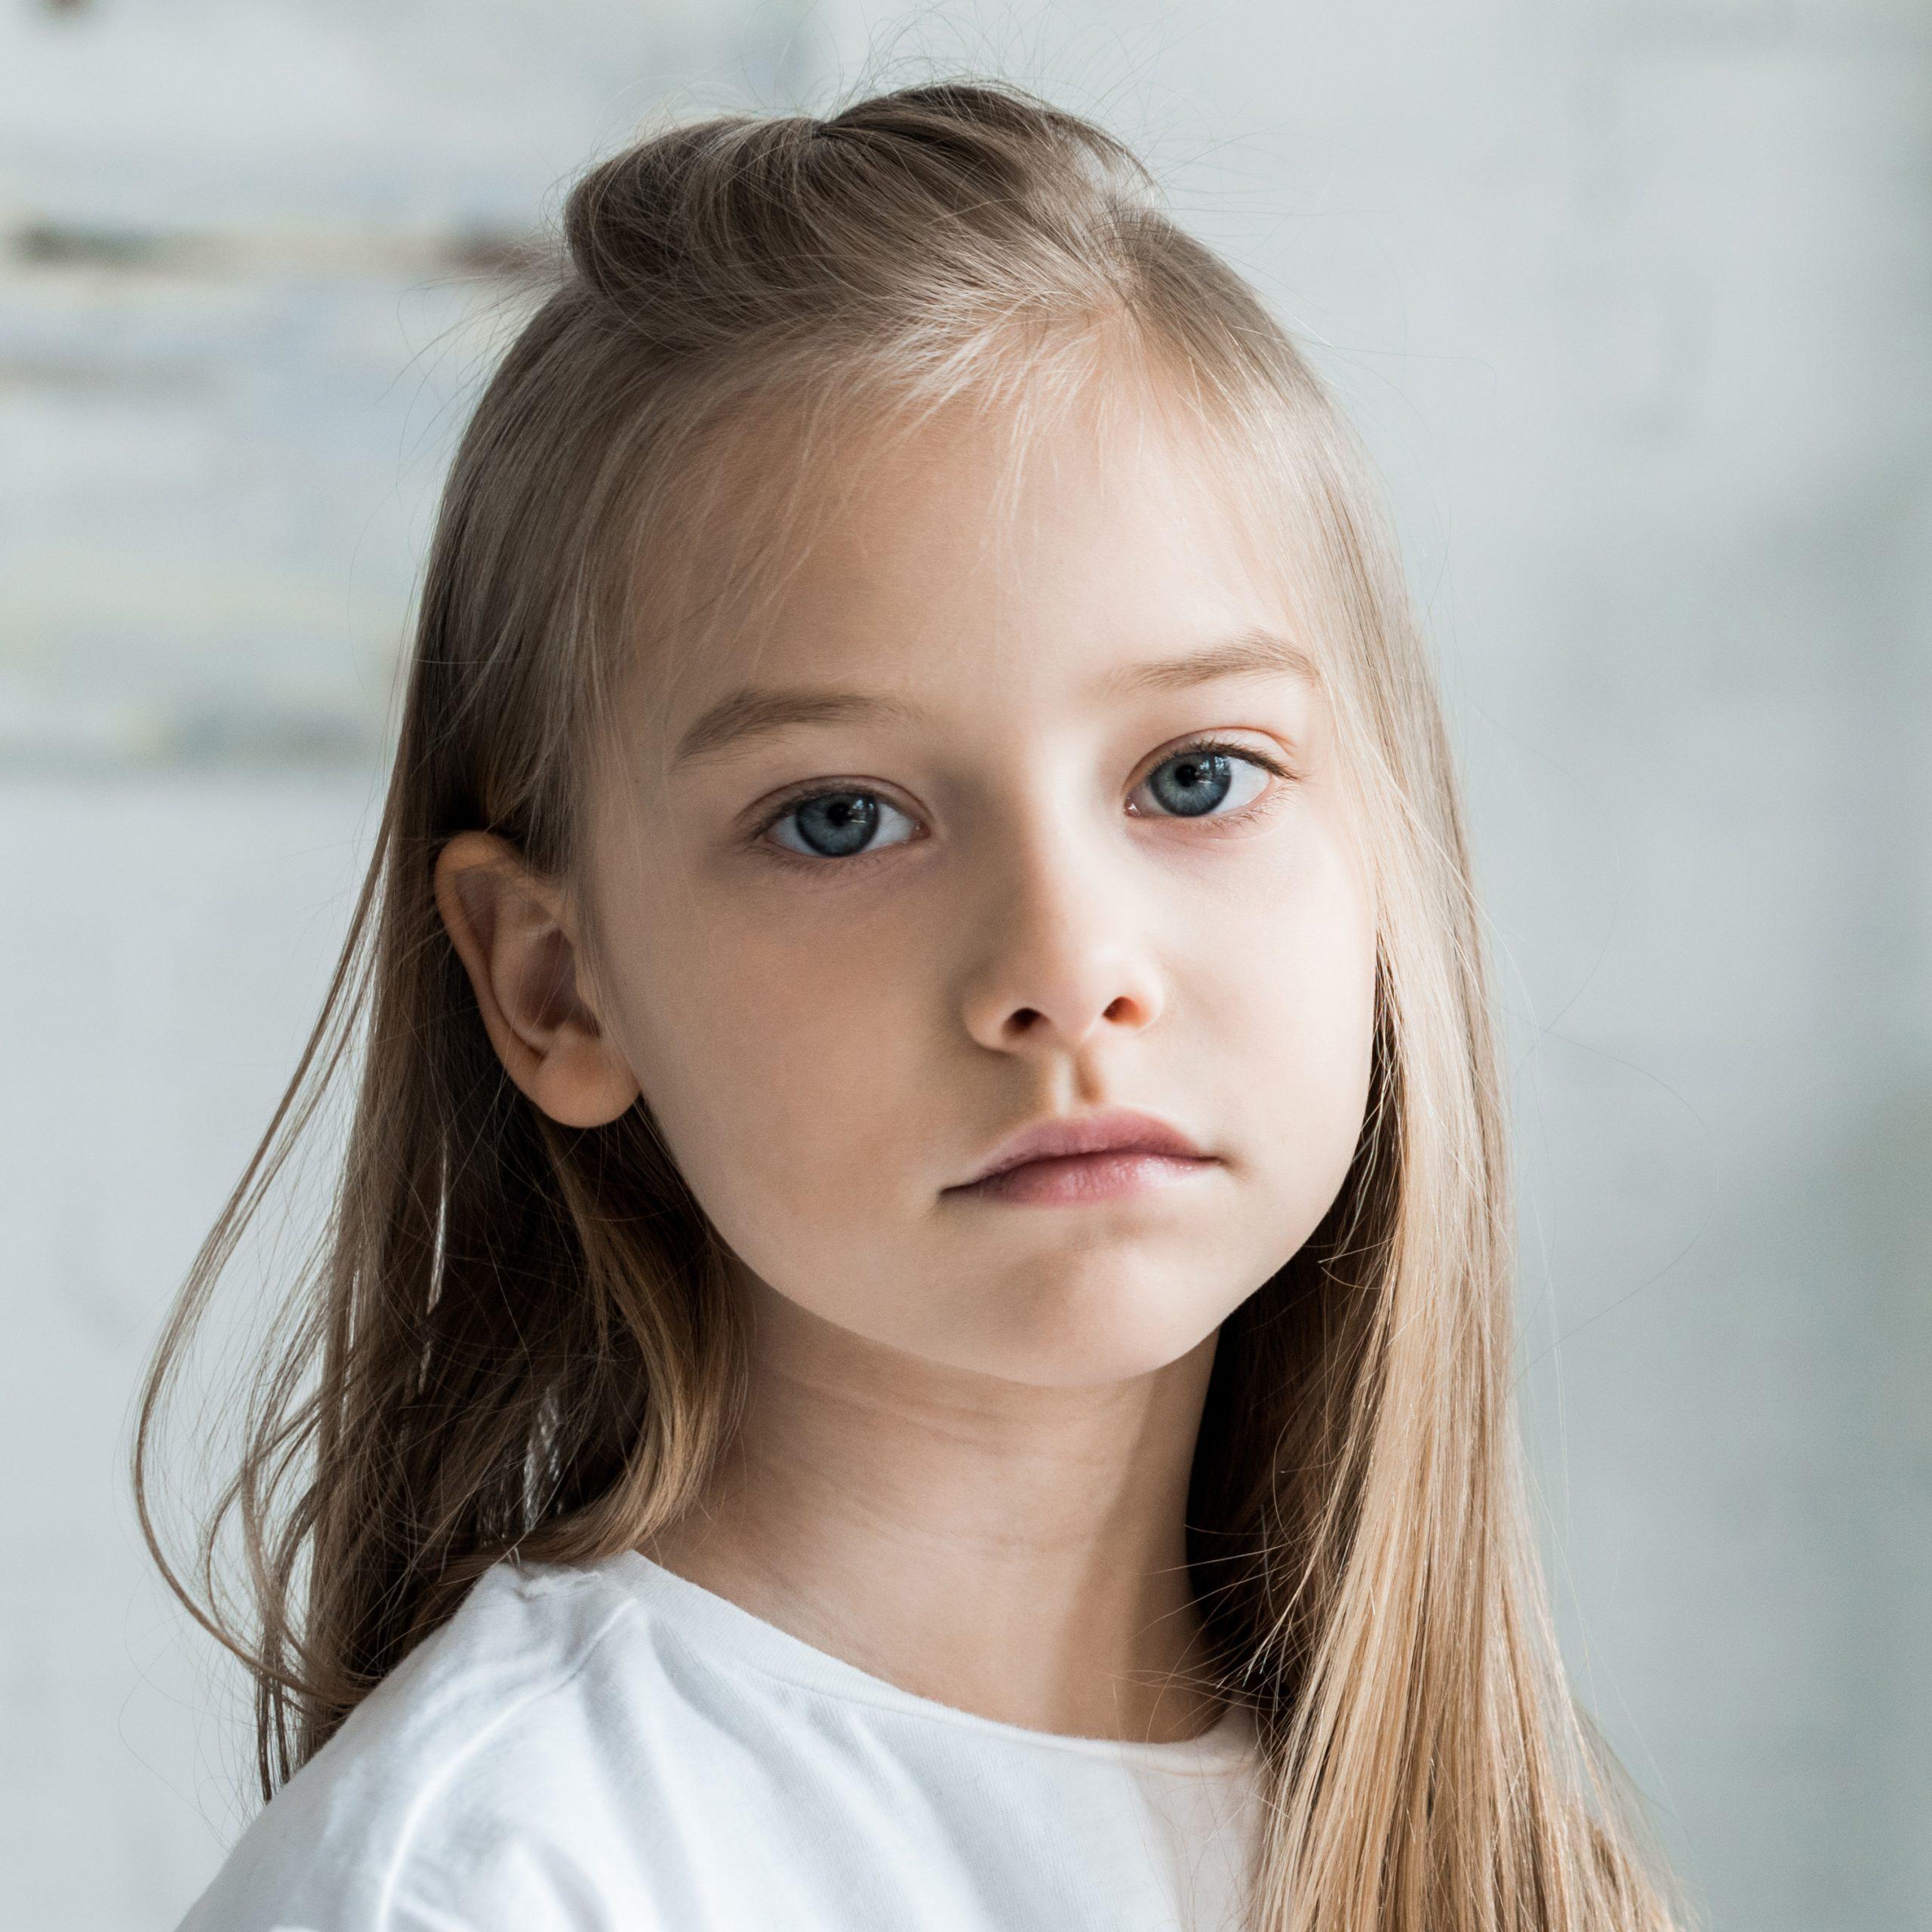 image-jeune-fille-triste-mediation-karine-joly